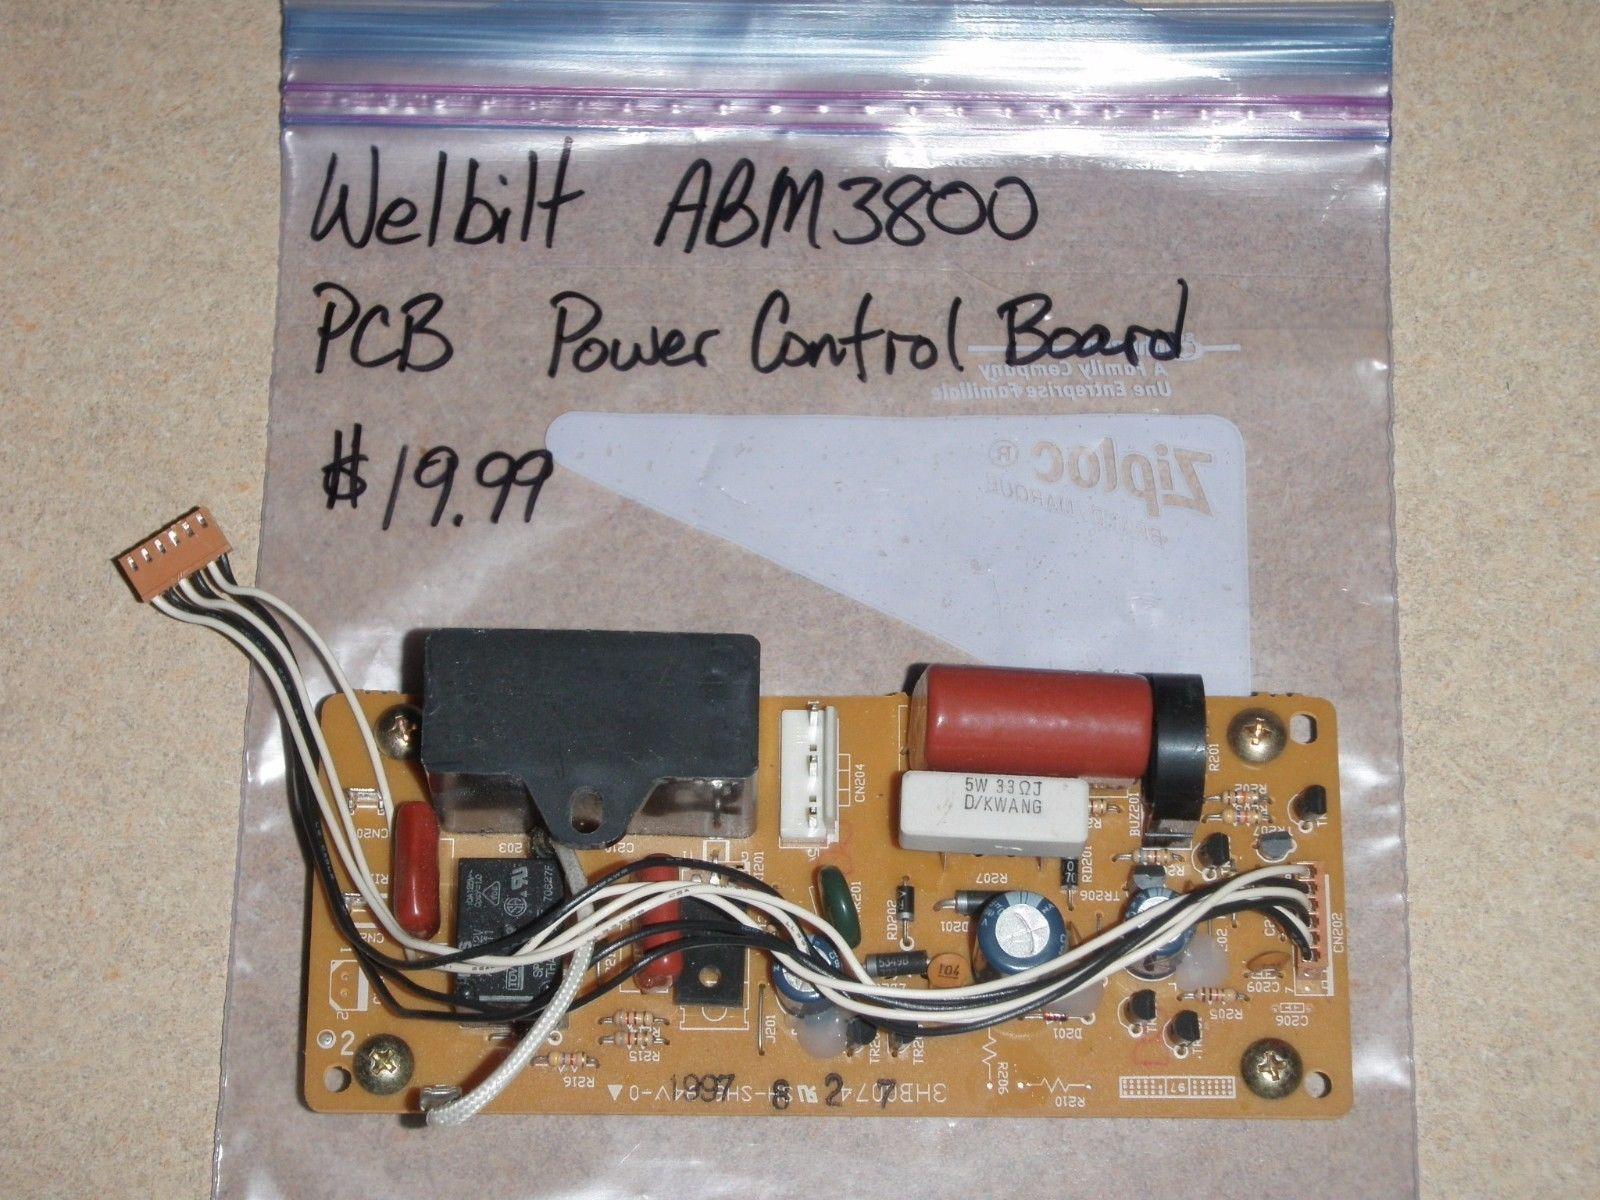 Welbilt Bread Machine Power Control Board (PCB) ABM3800 Parts - $18.69